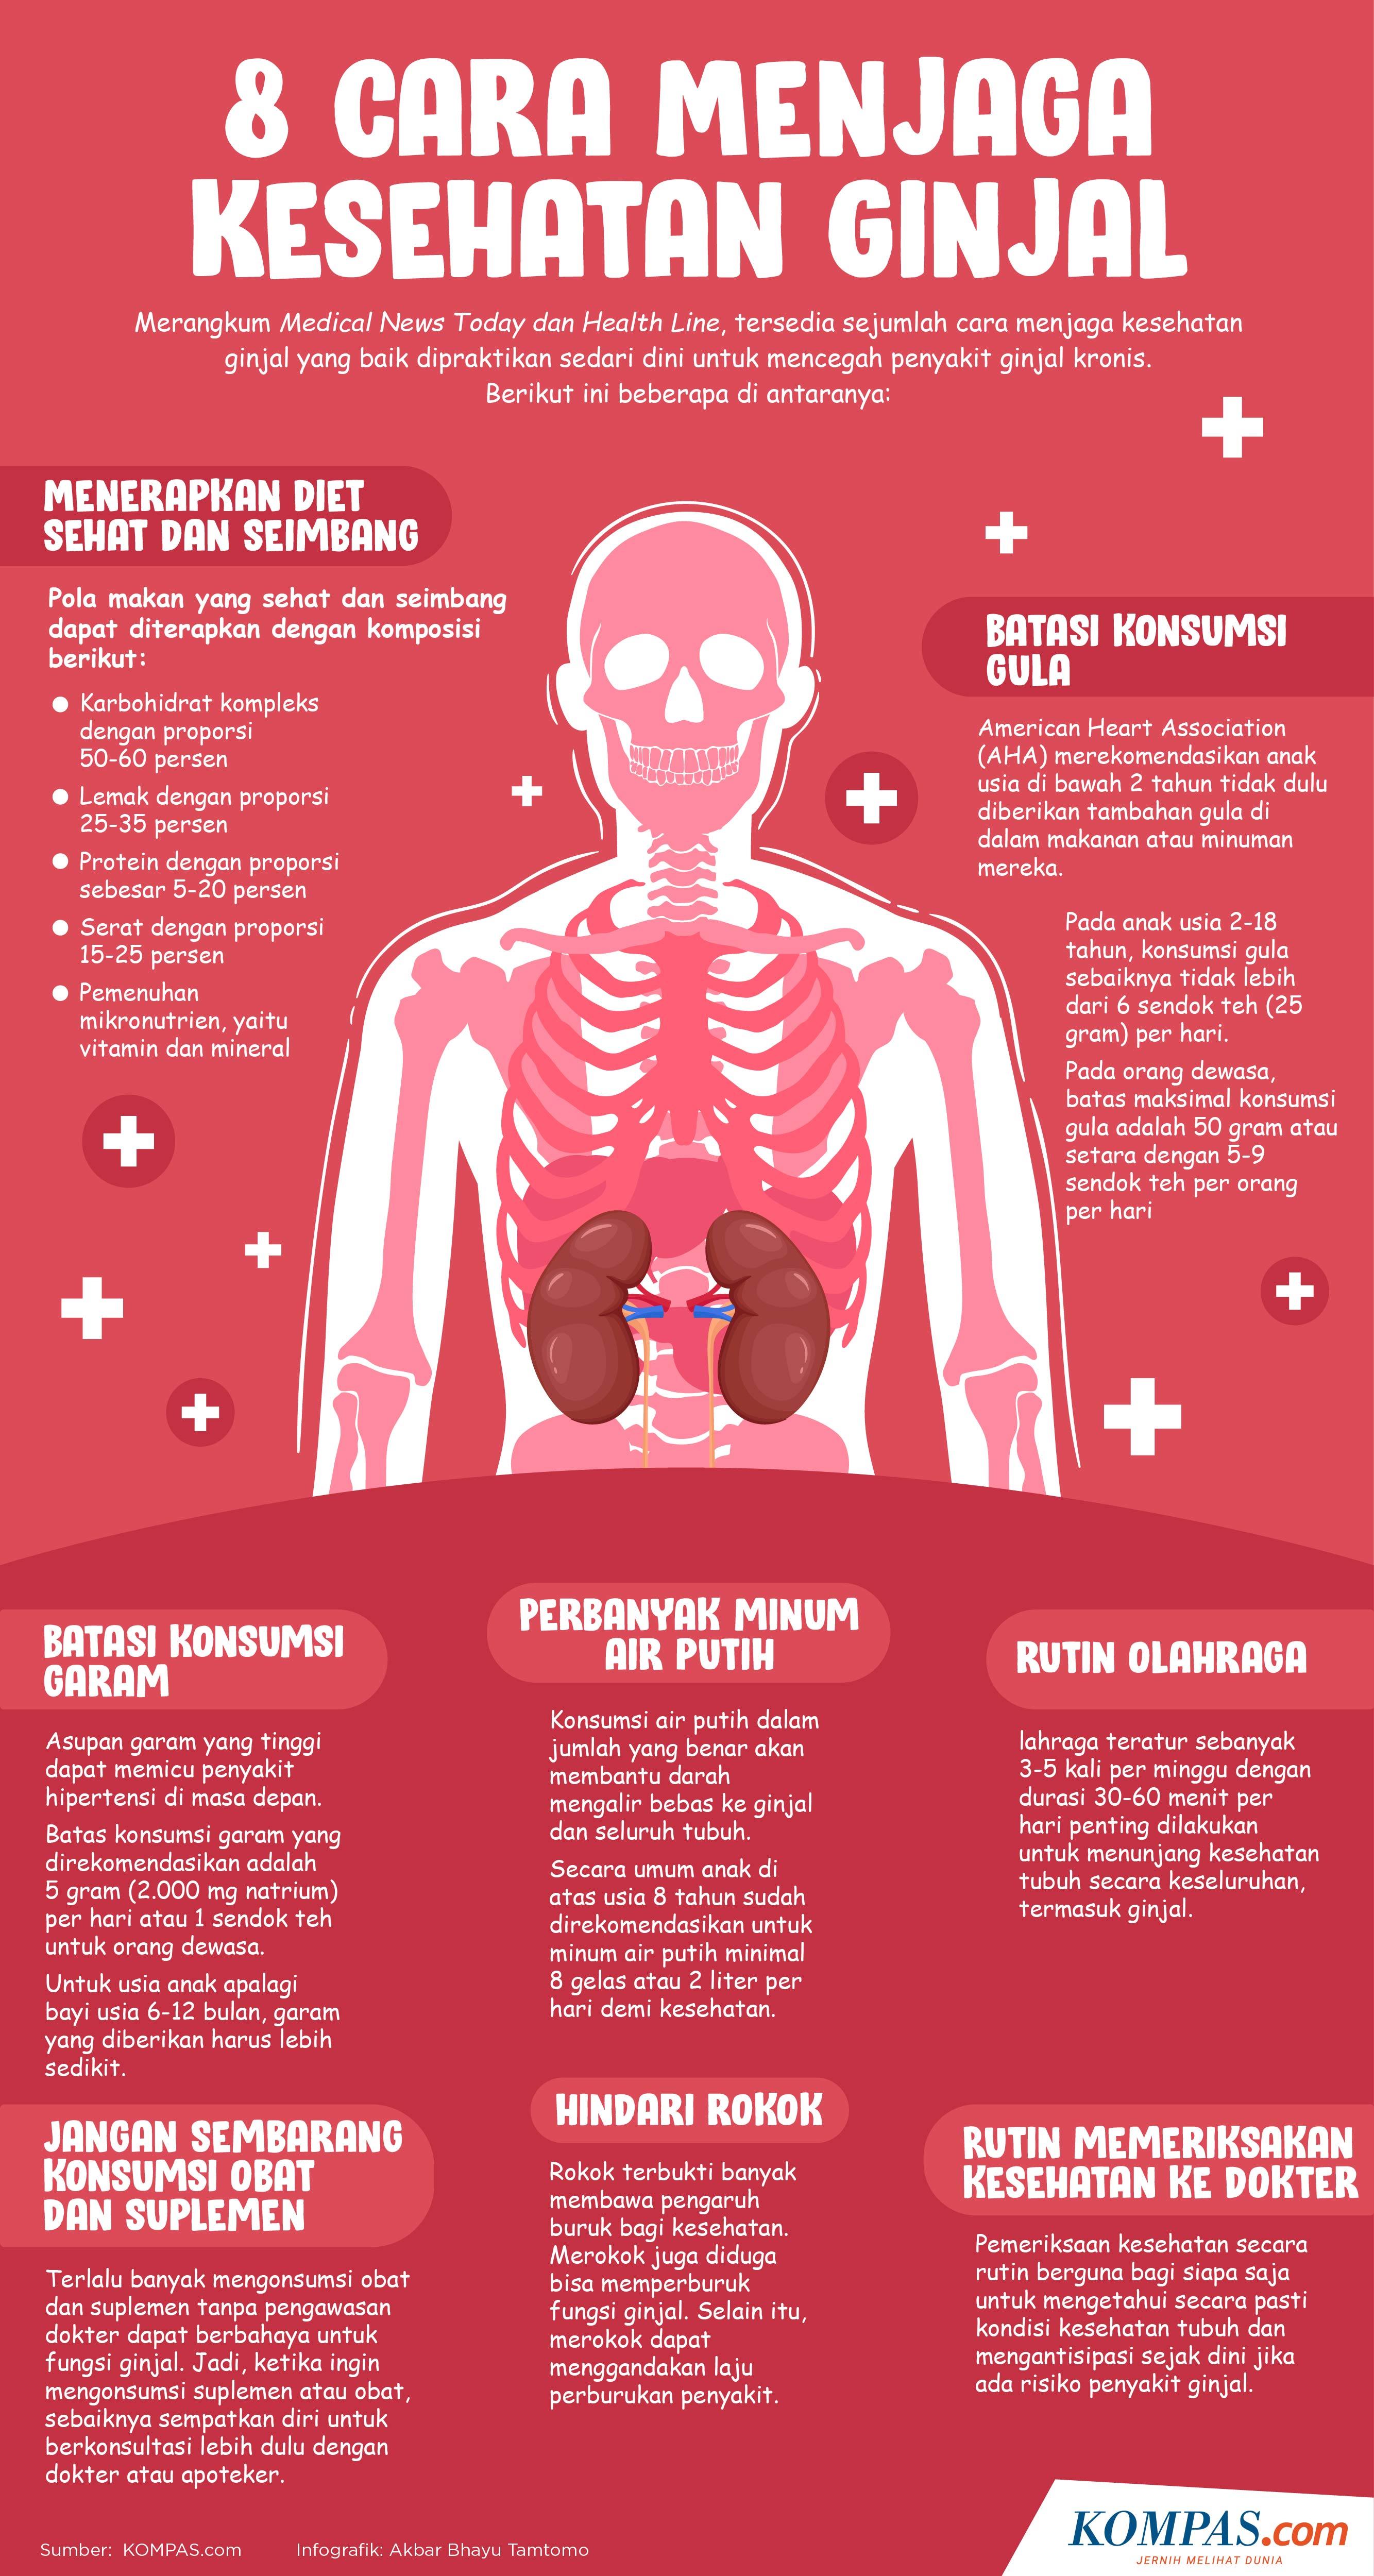 Infografik 8 Cara Menjaga Kesehatan Ginjal